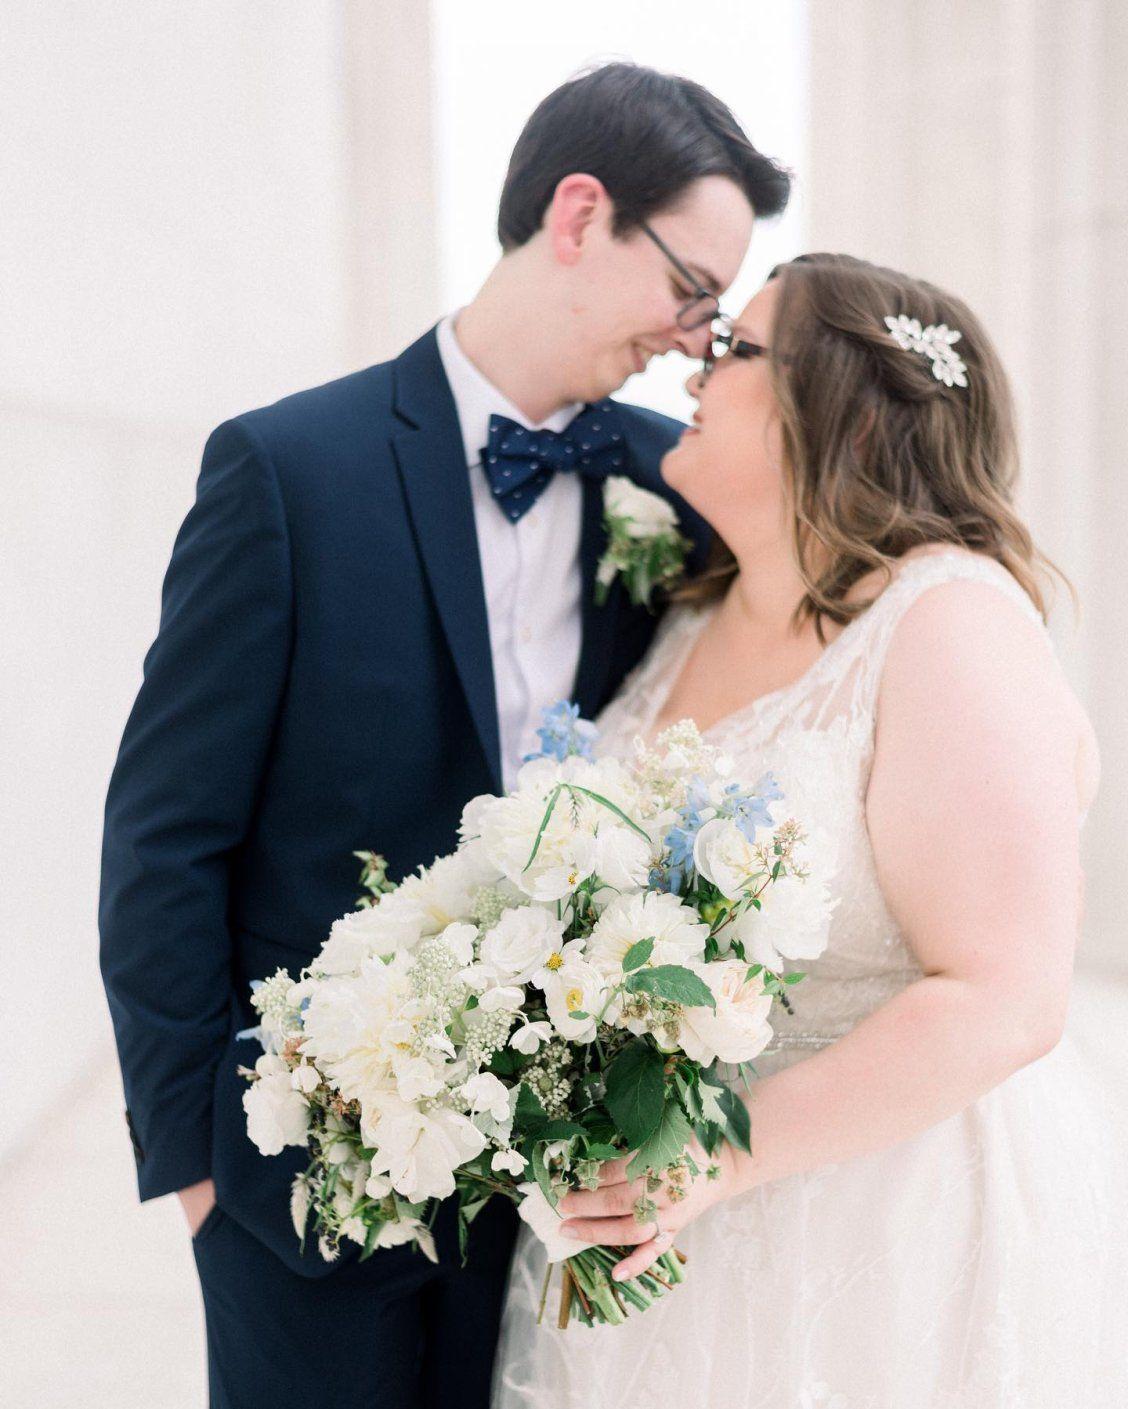 Unique Plus Size Wedding Dresses Maggiesottero Wedding Weddingdress Weddinginspo Weddinginspiration P Balboa Park Wedding Theatre Wedding Wedding Dresses [ 1409 x 1128 Pixel ]